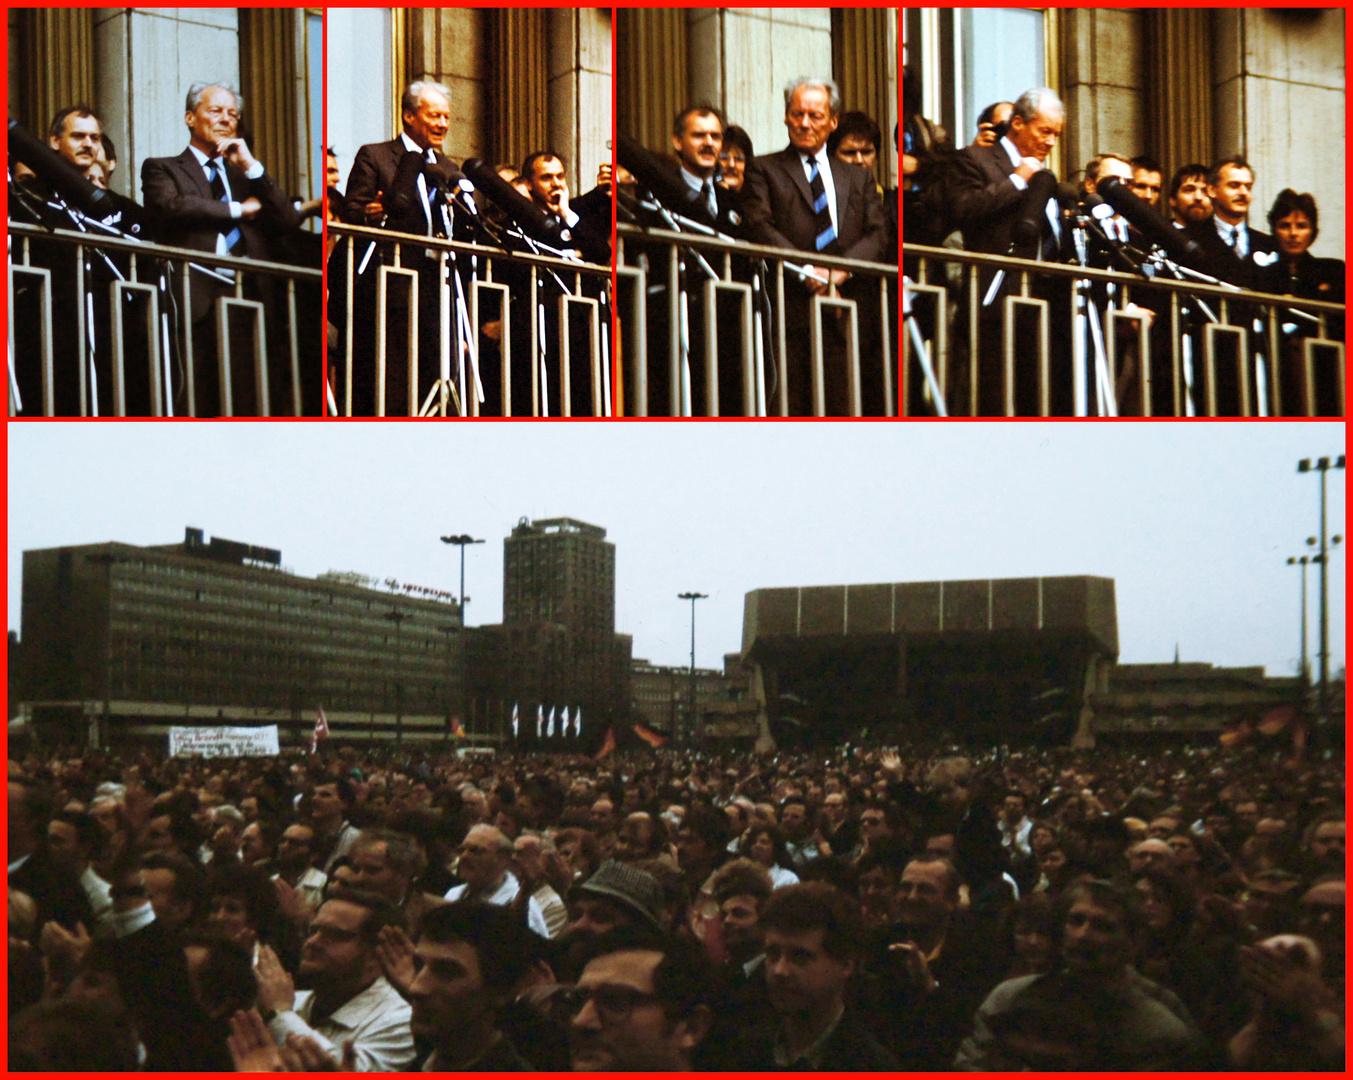 Leipzig, 26. Februar 1990: Willy Brandt